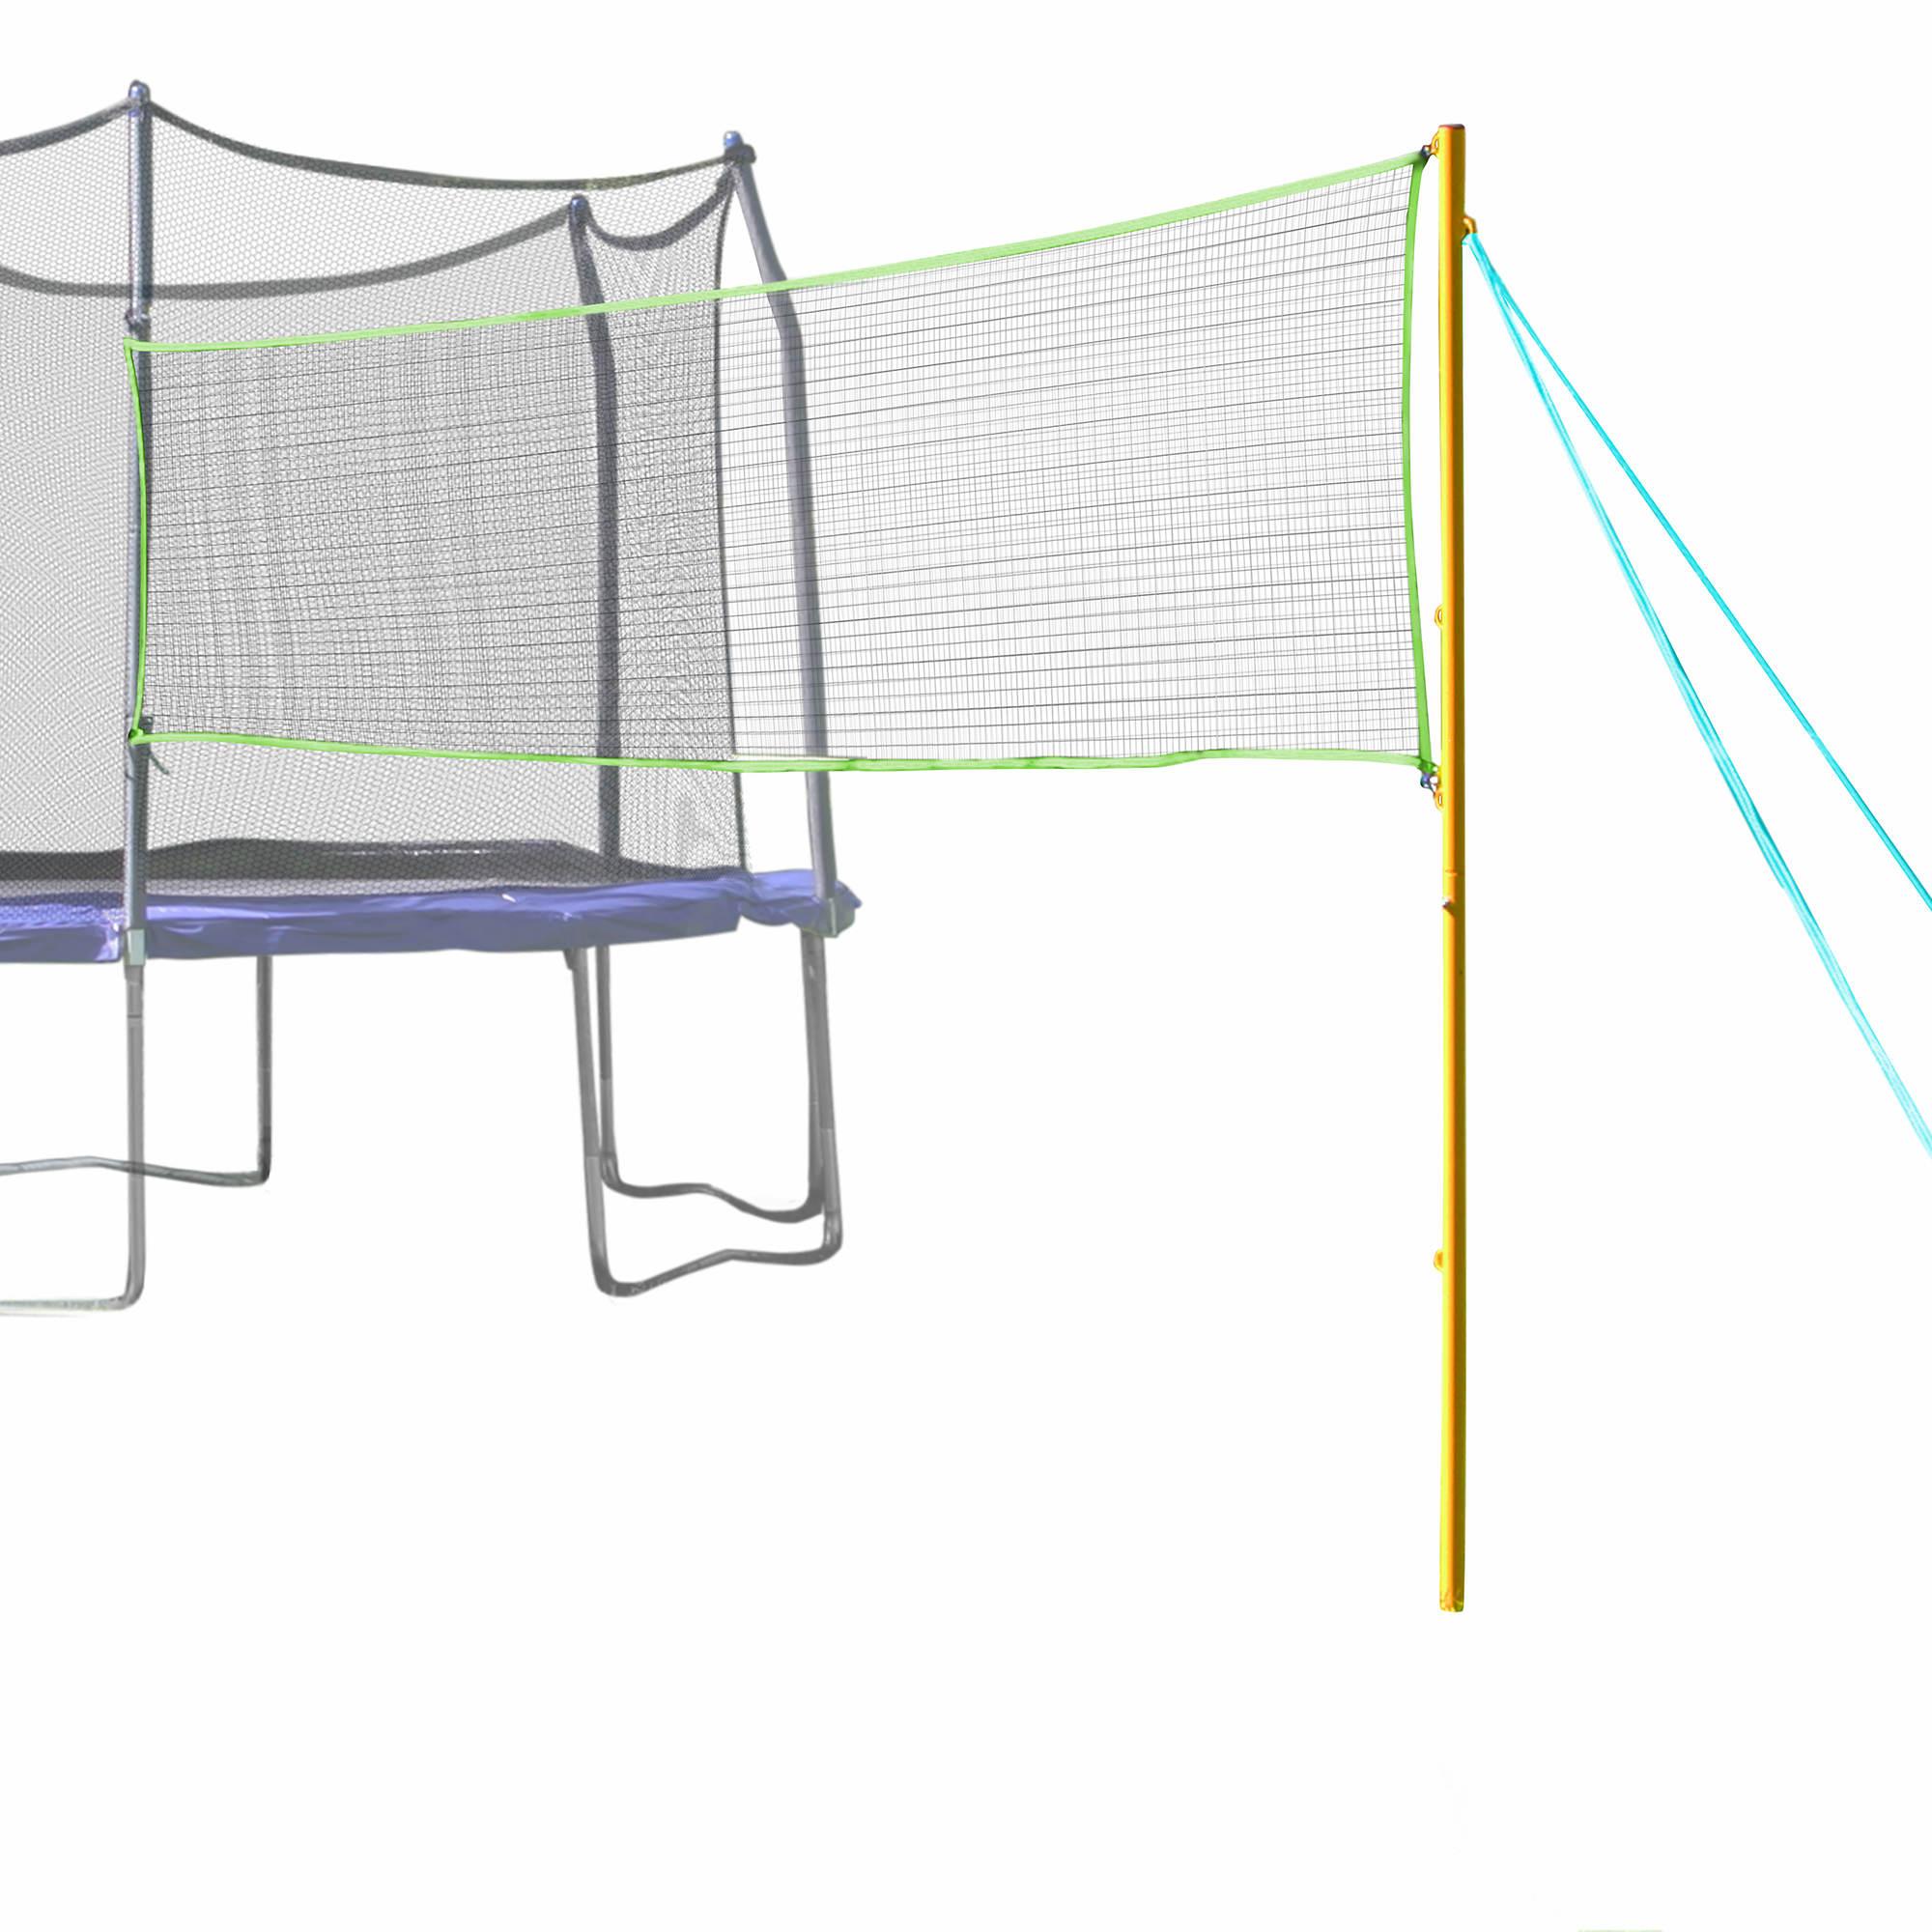 Skywalker Trampolines Volleyball Net Accessory